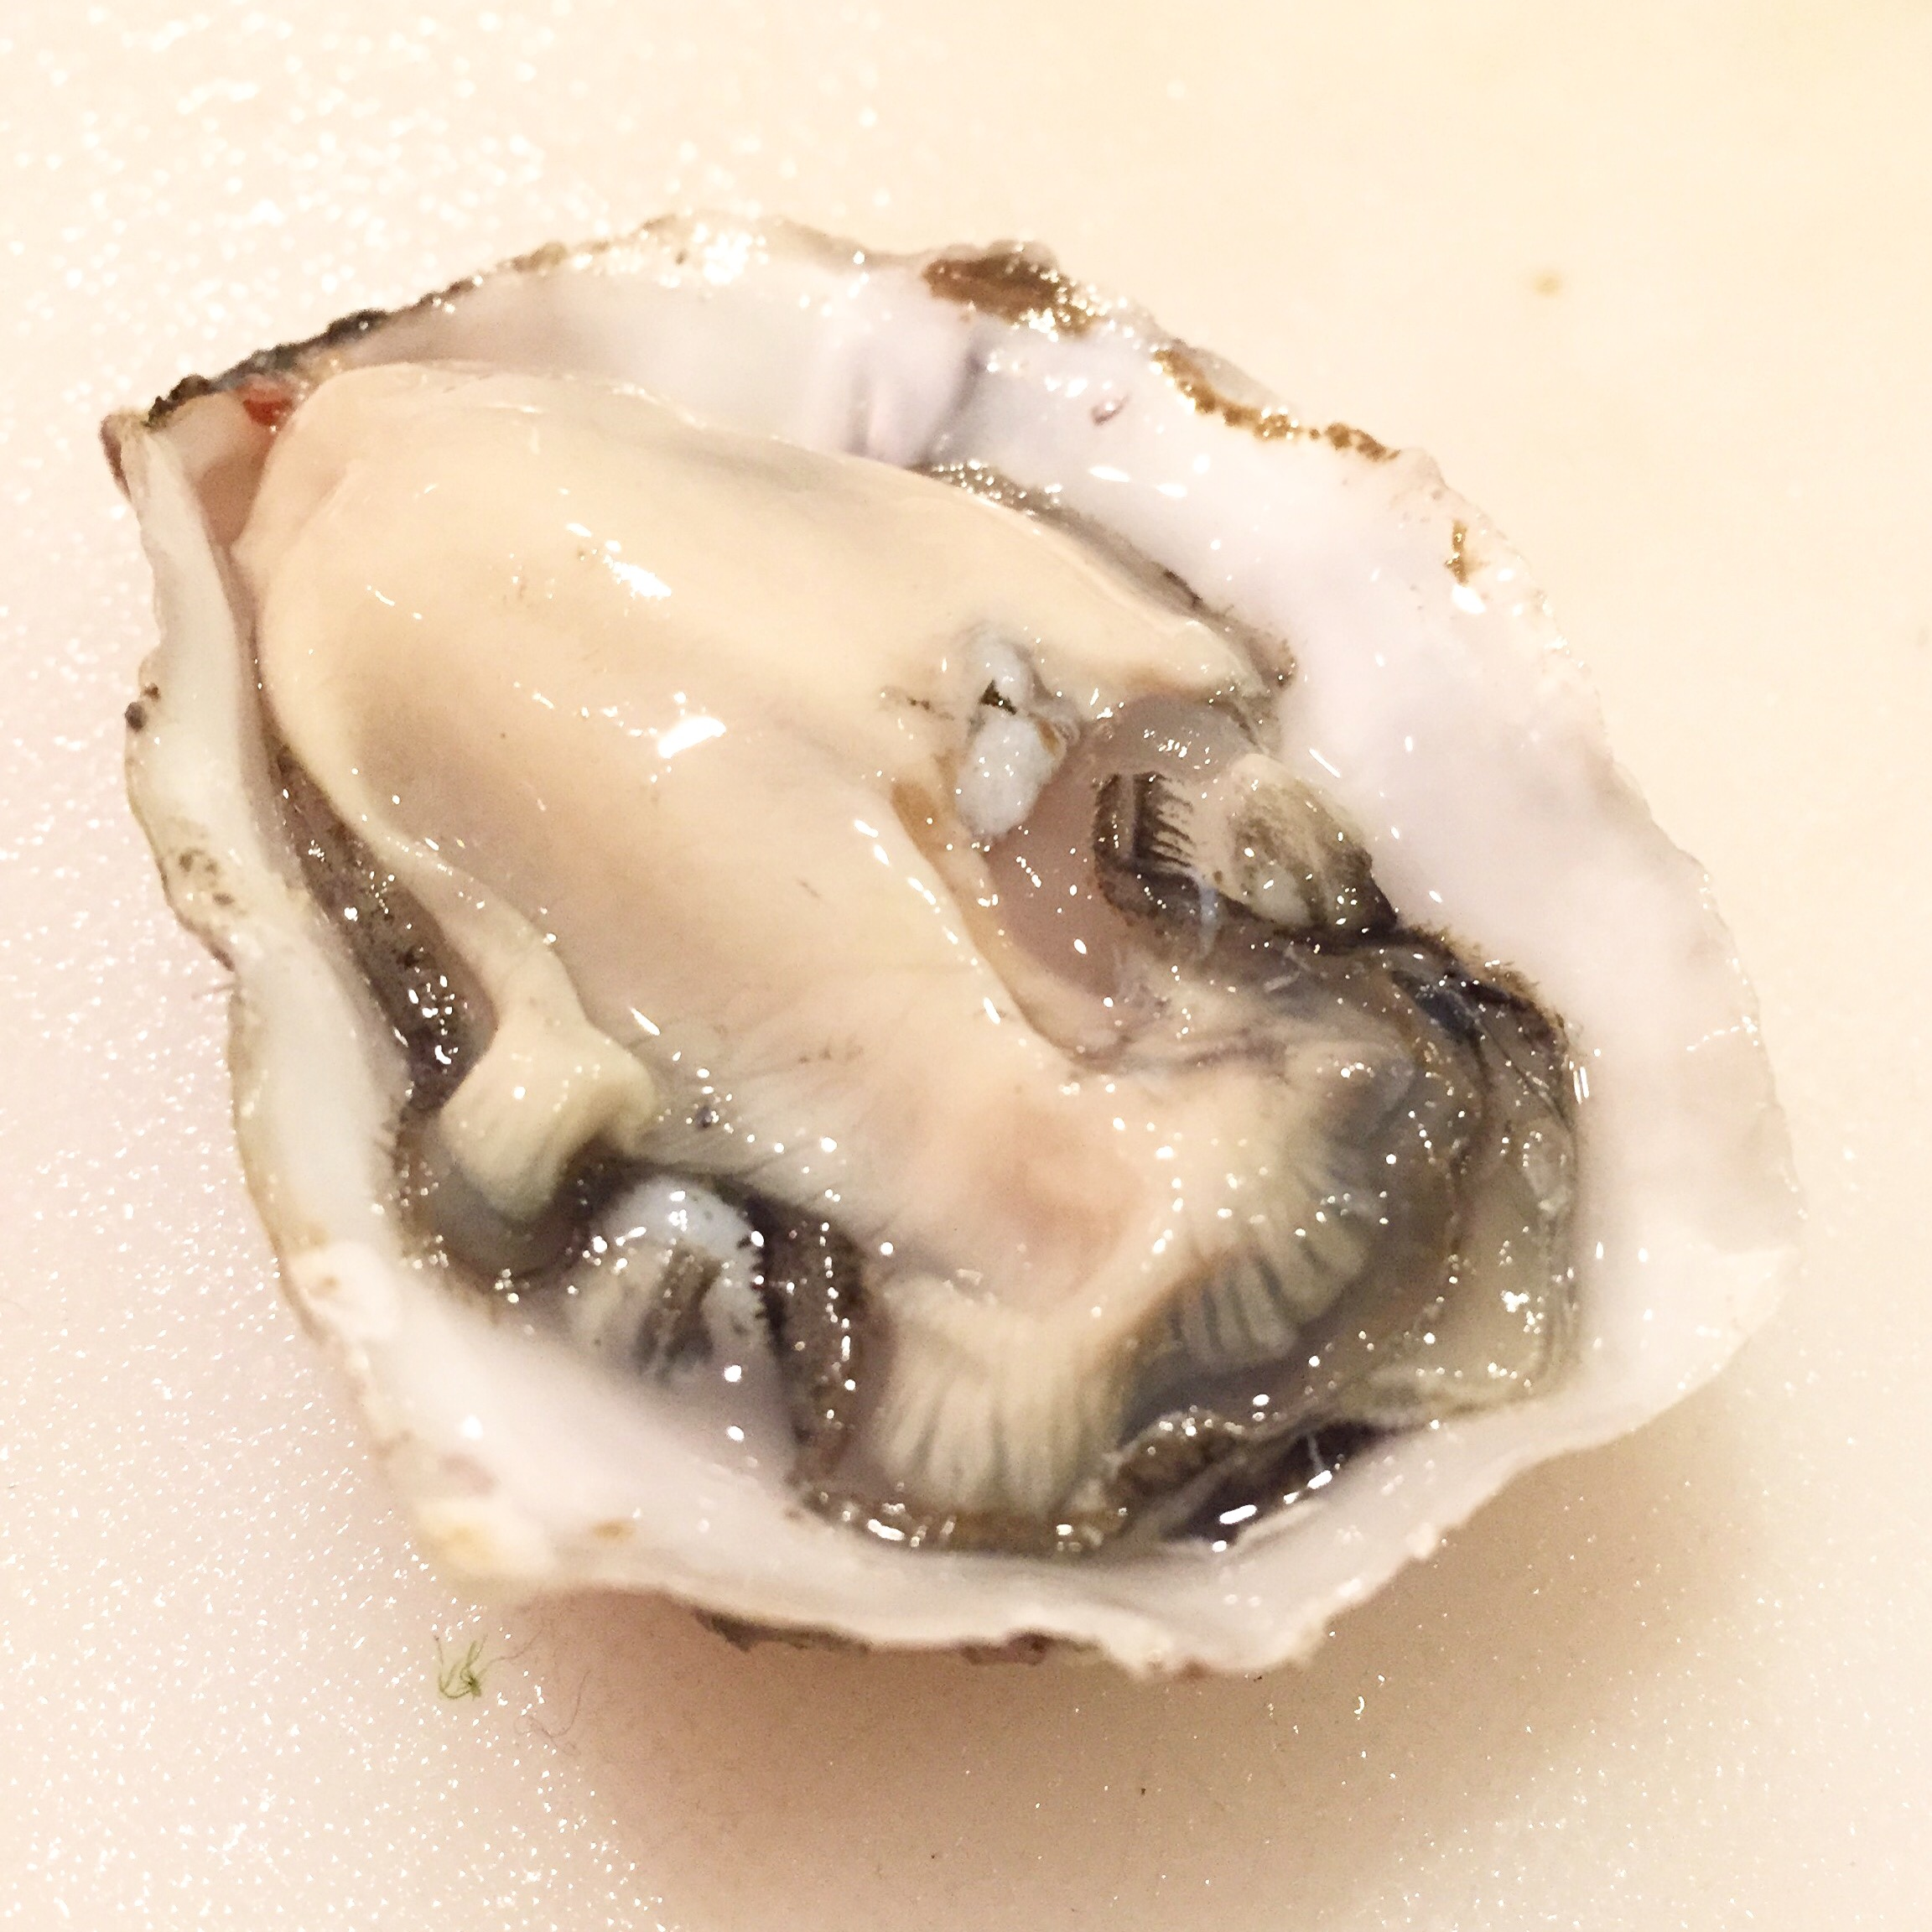 coromandeloyster